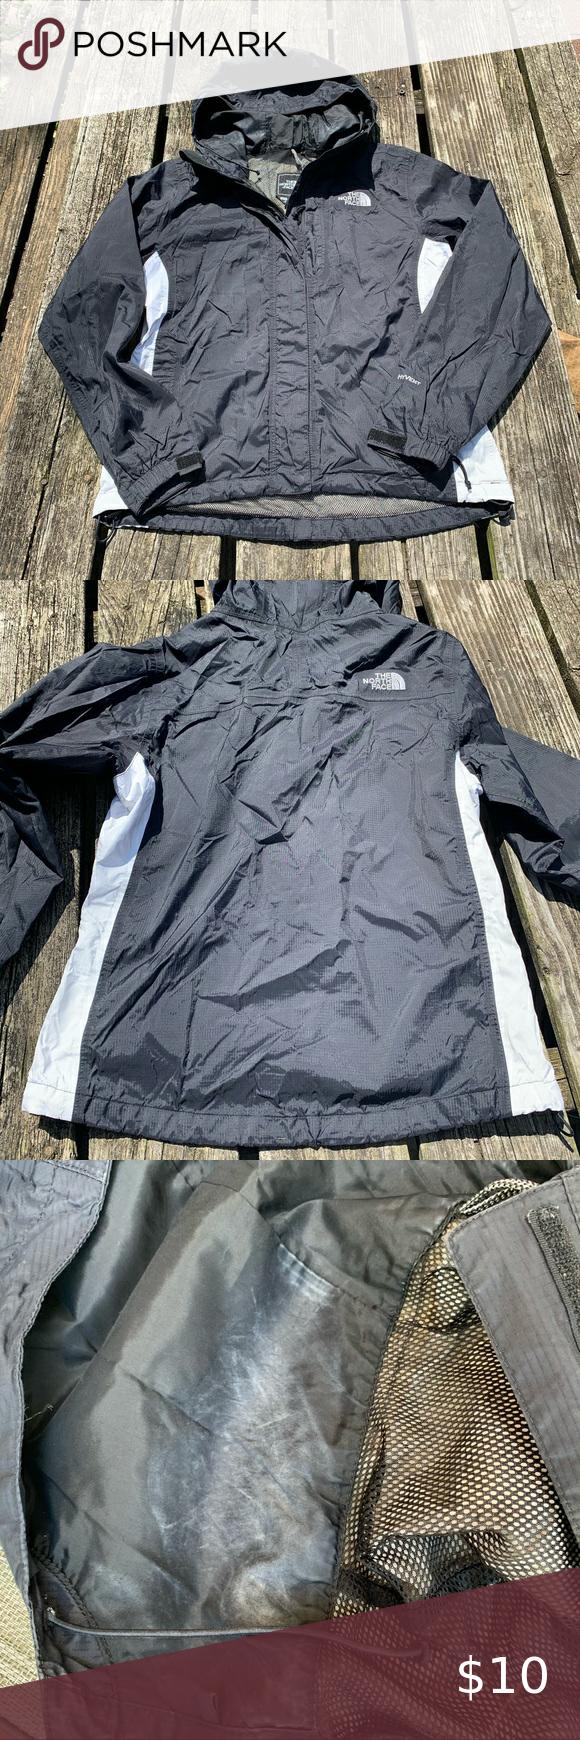 3 For 25 North Face Rain Jacket North Face Rain Jacket Black North Face The North Face [ 1740 x 580 Pixel ]